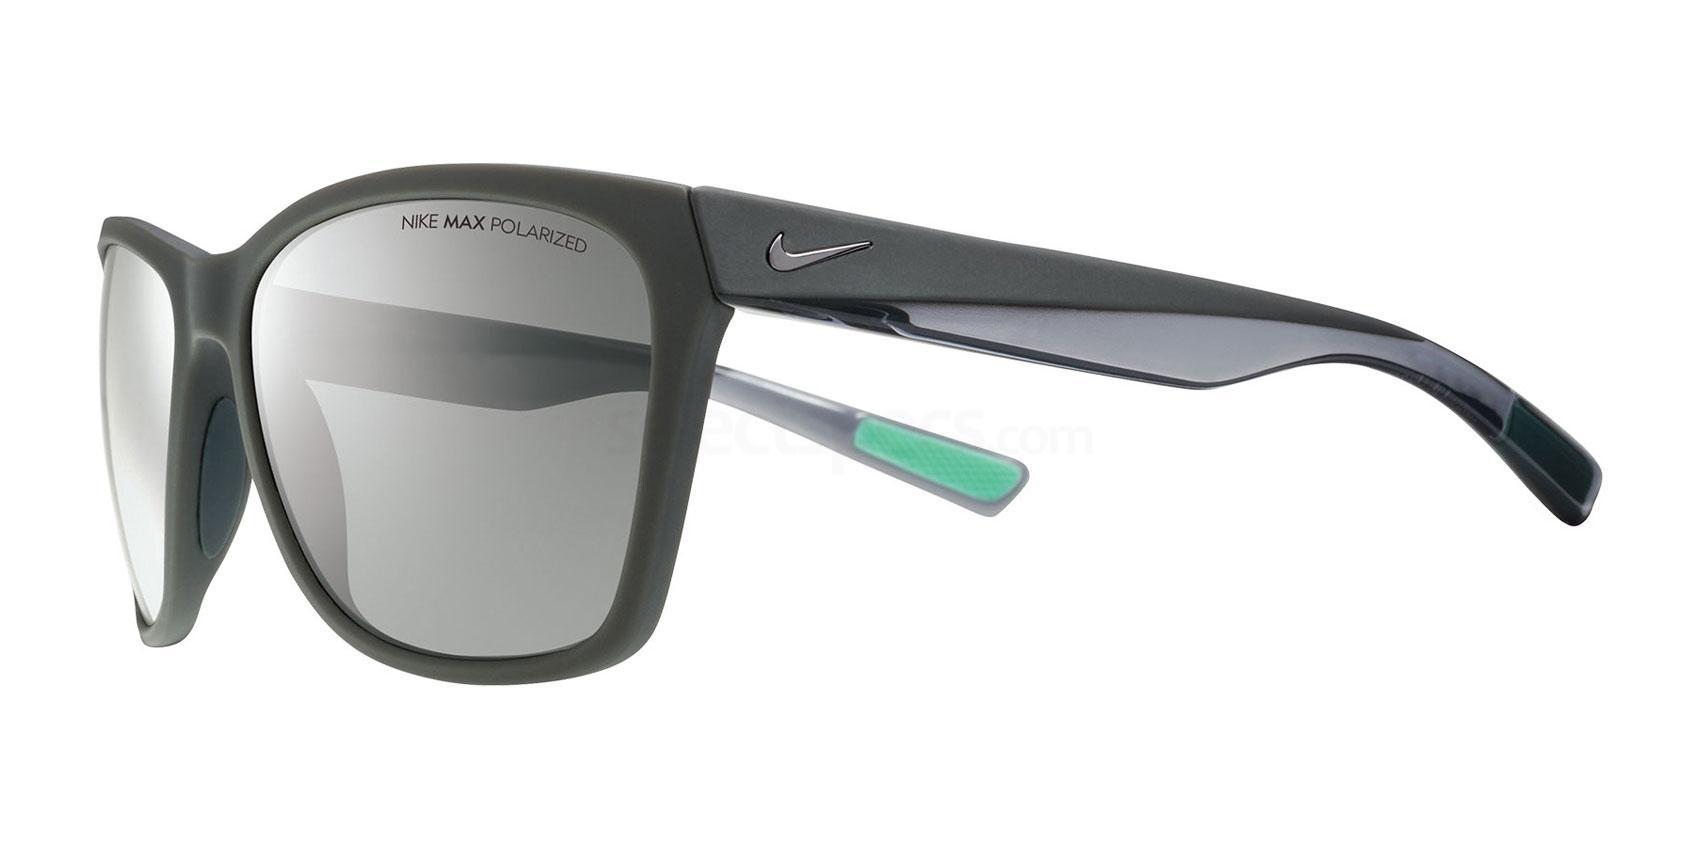 066 VITAL P EV0924 Sunglasses, Nike